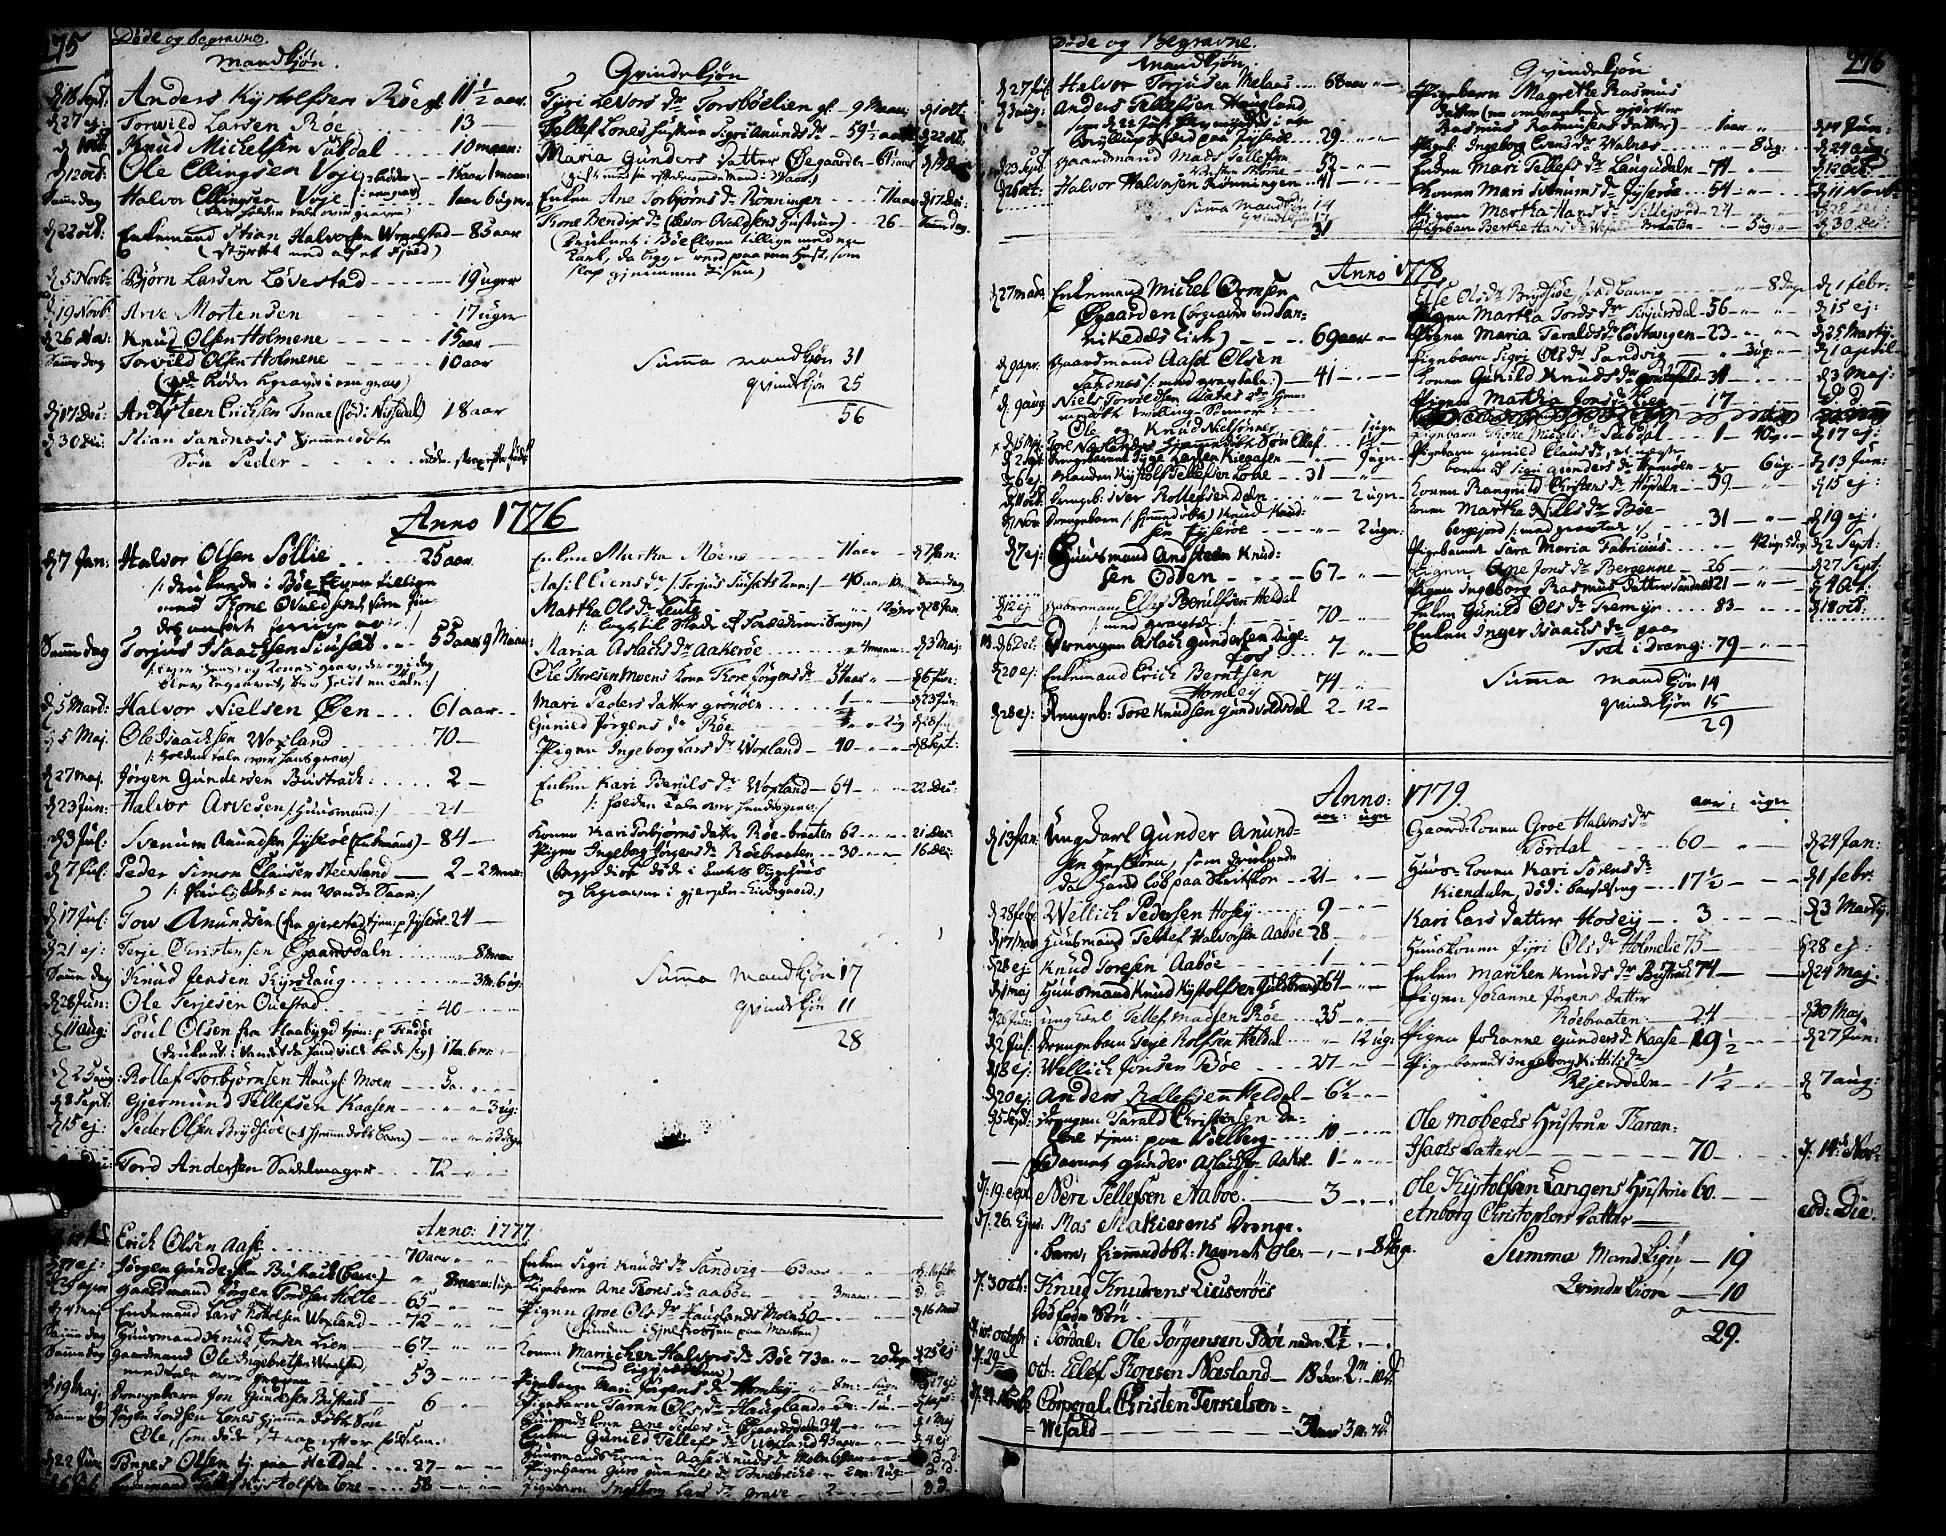 SAKO, Drangedal kirkebøker, F/Fa/L0003: Ministerialbok nr. 3, 1768-1814, s. 275-276